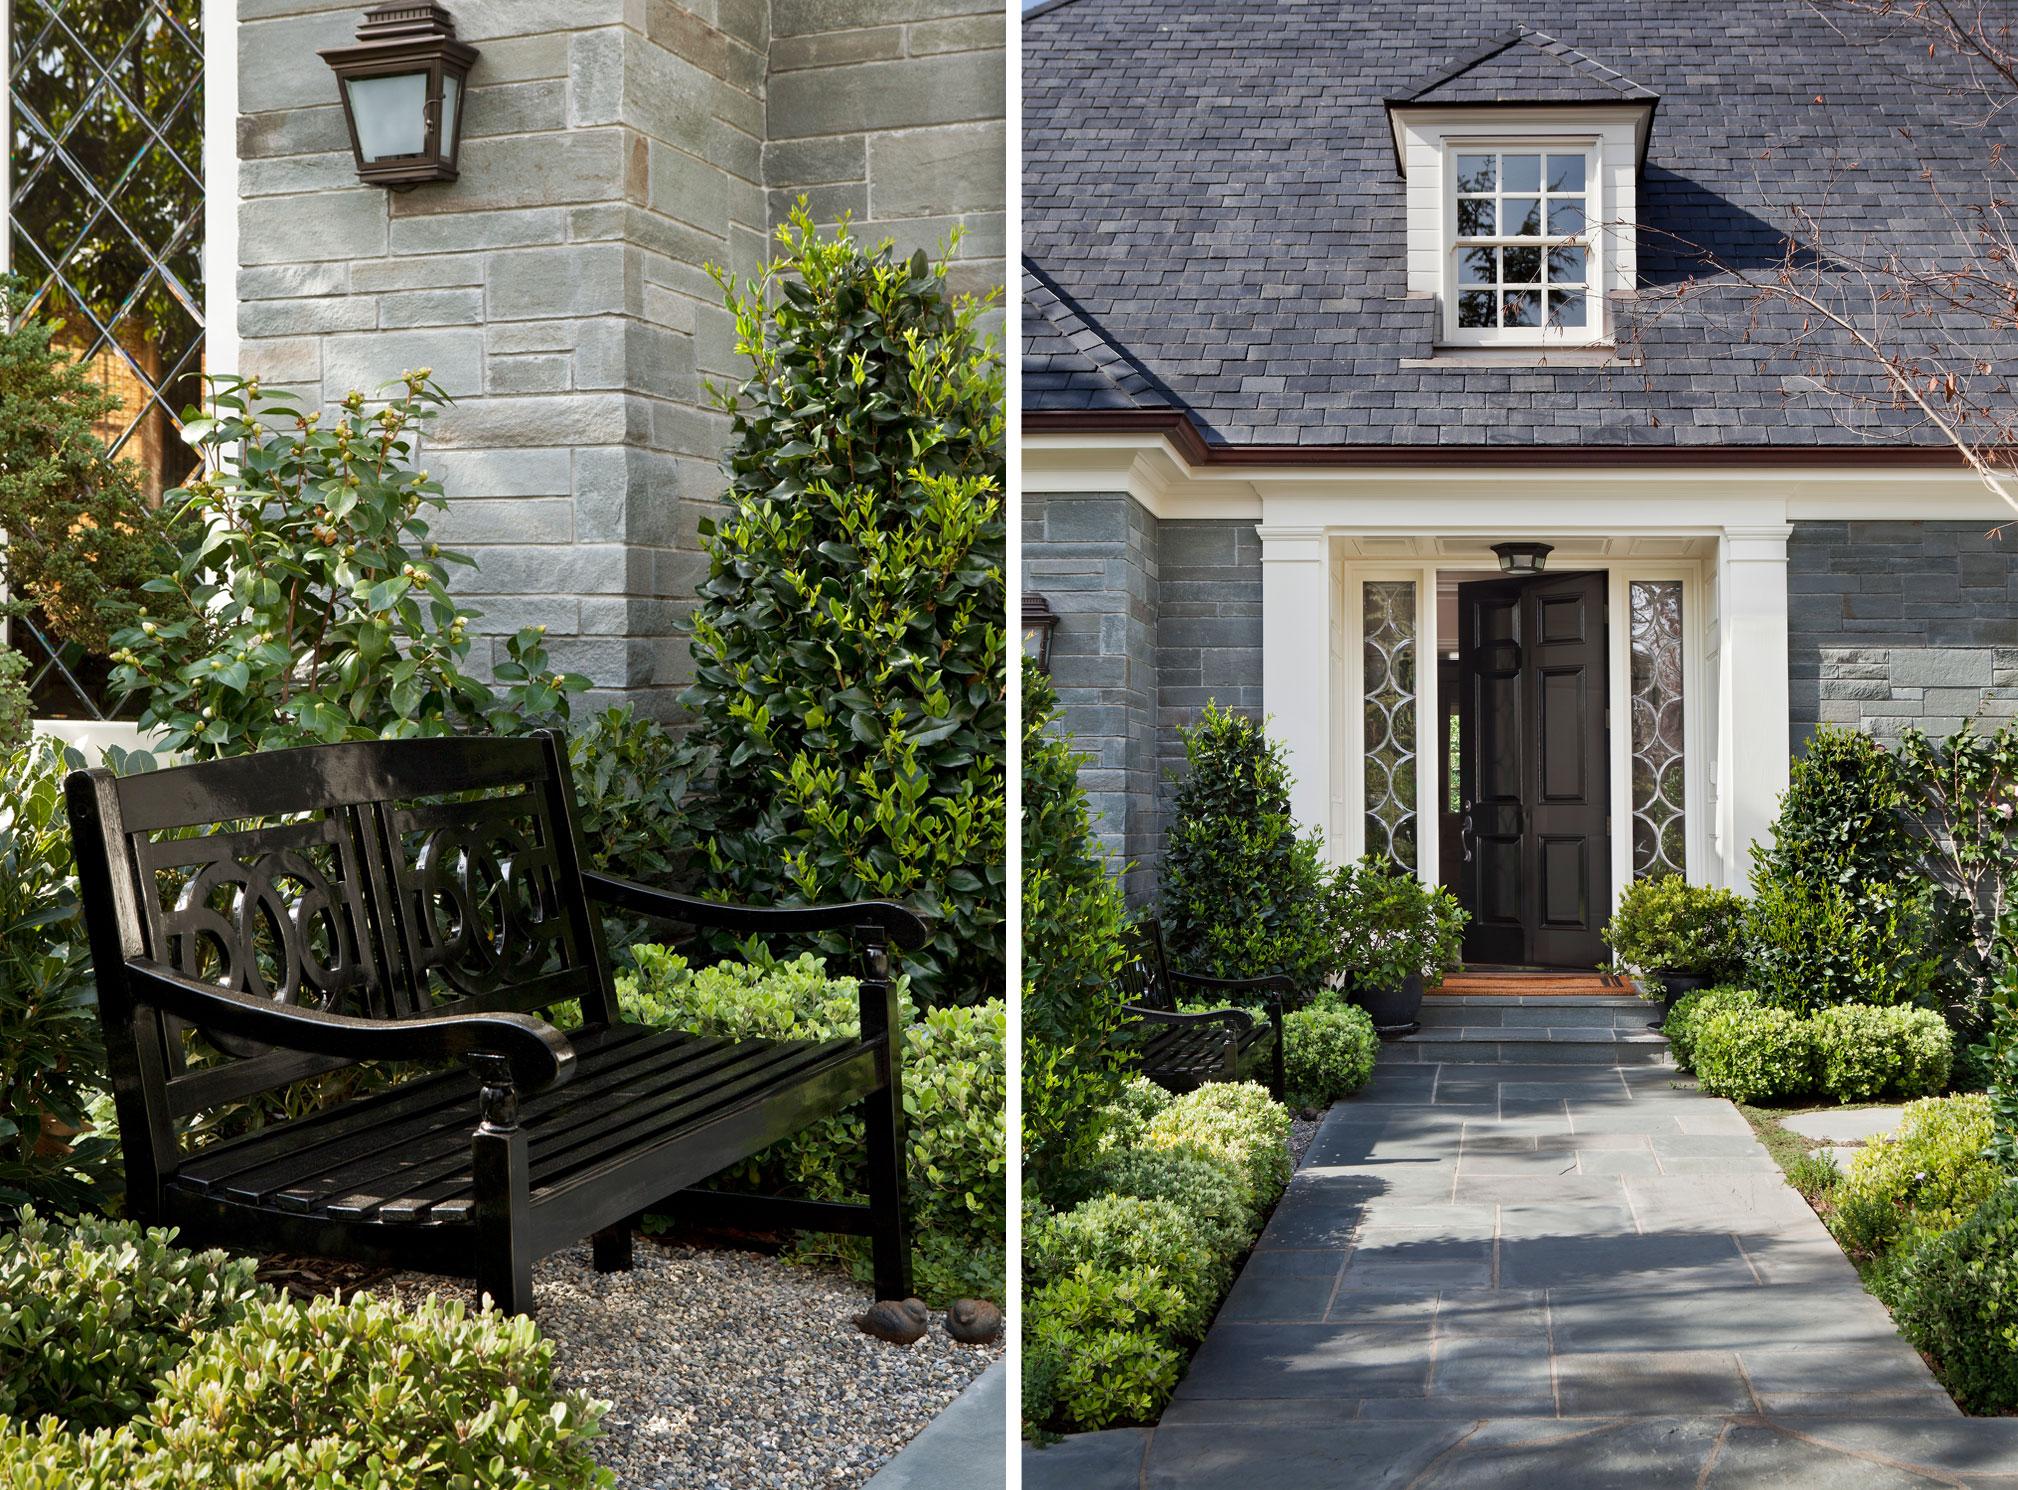 traditional-bluestone-house-slate-roof-front-entry-door-ward-jewell.jpg